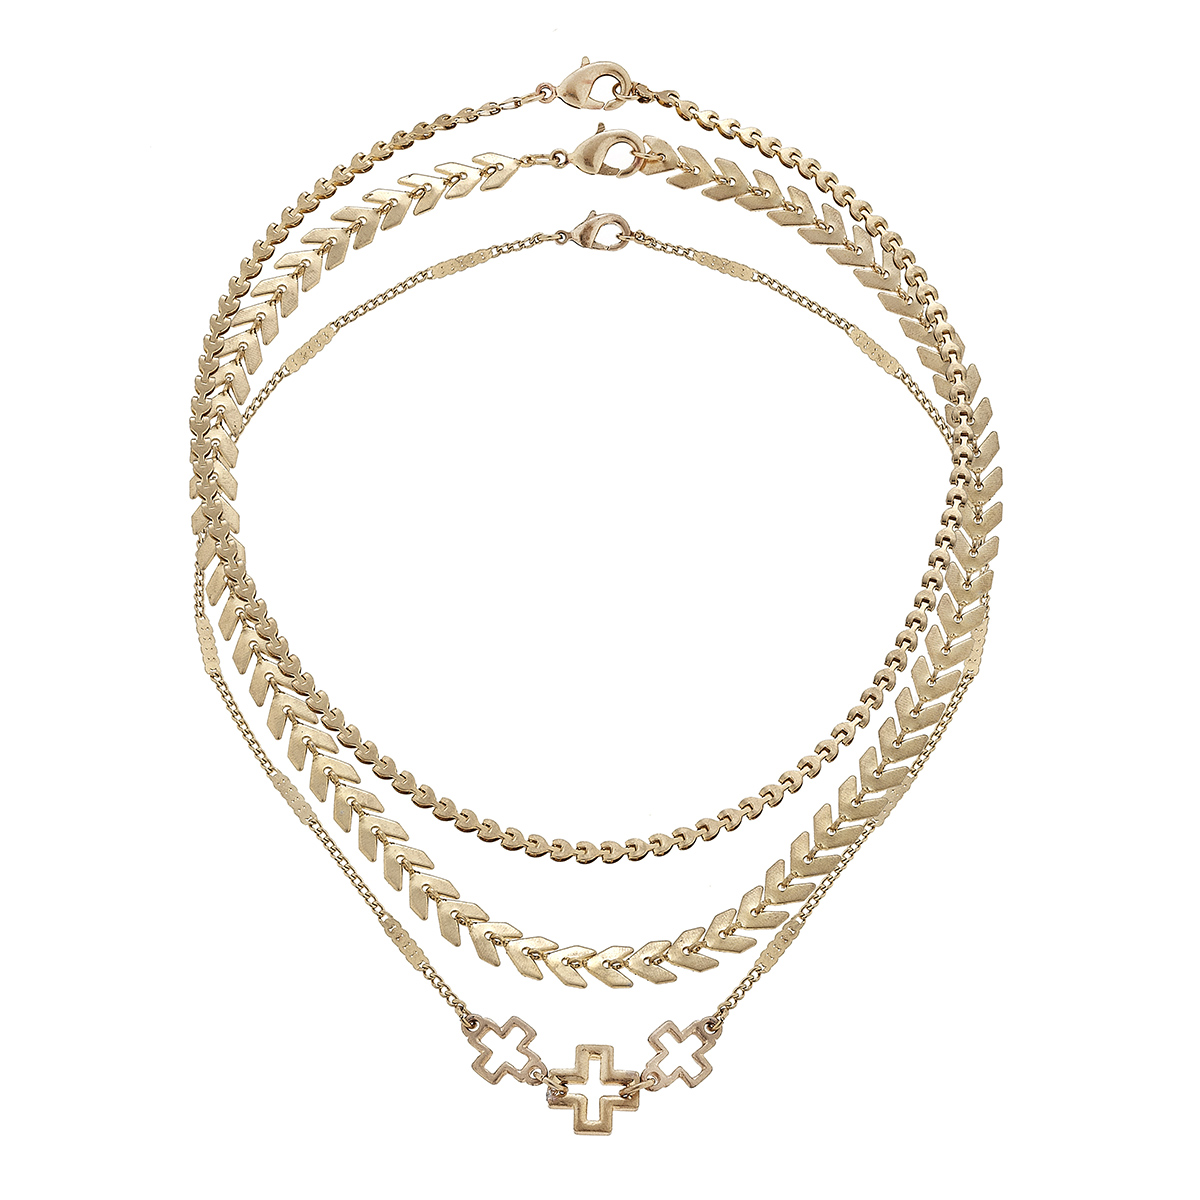 3 Set Necklace Combo